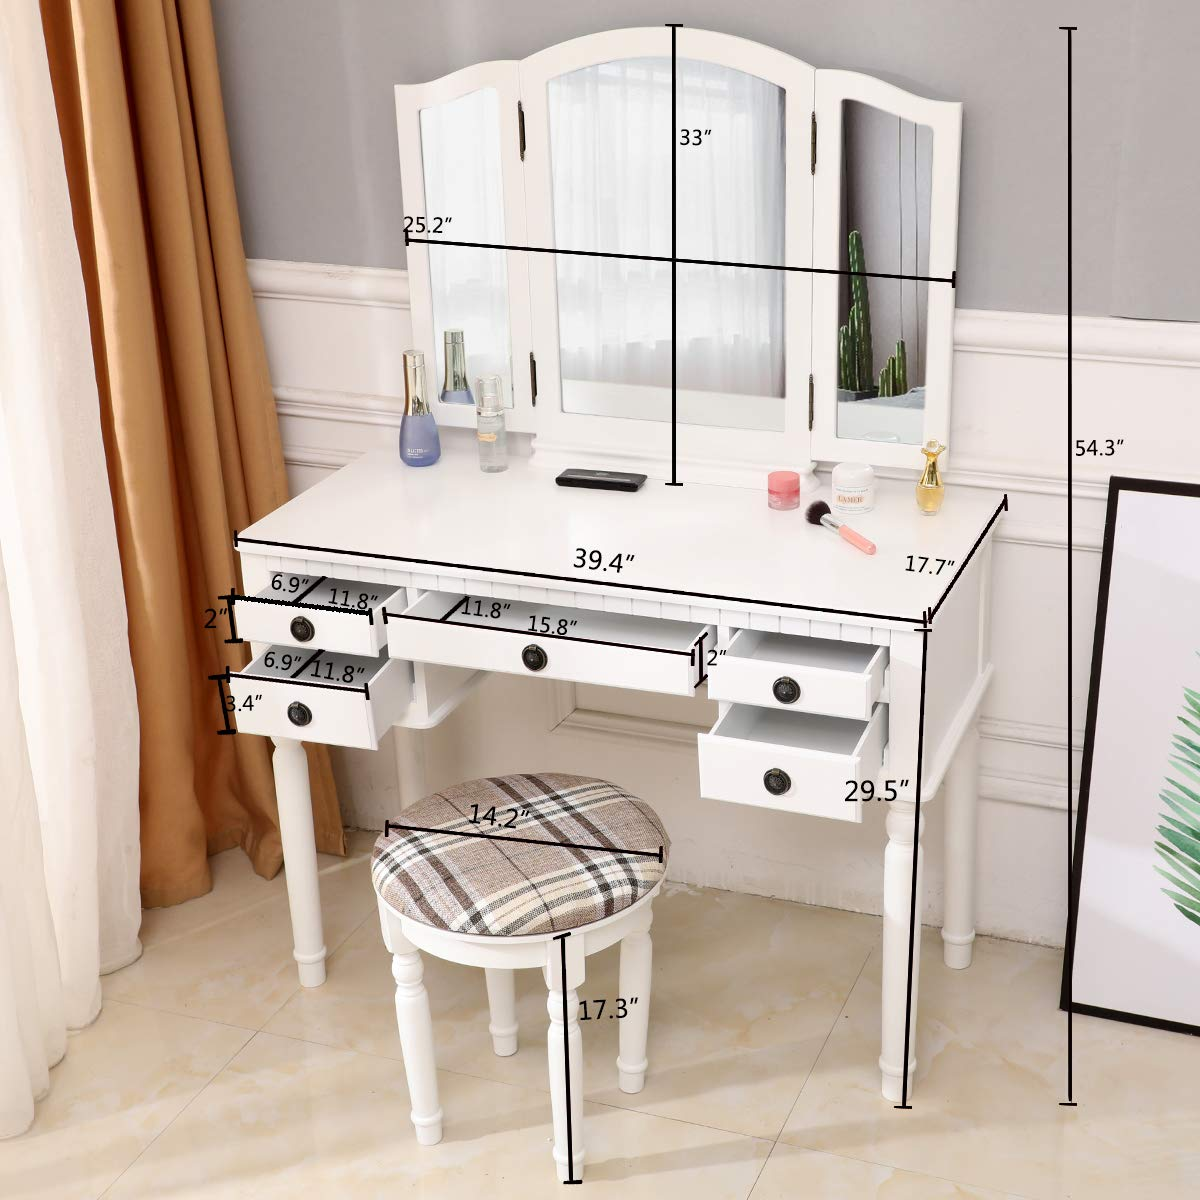 ryokozashi Vanity Table Set, Tri-Folding Mirror Dressing Table and Stool Set 5 Drawers for Women